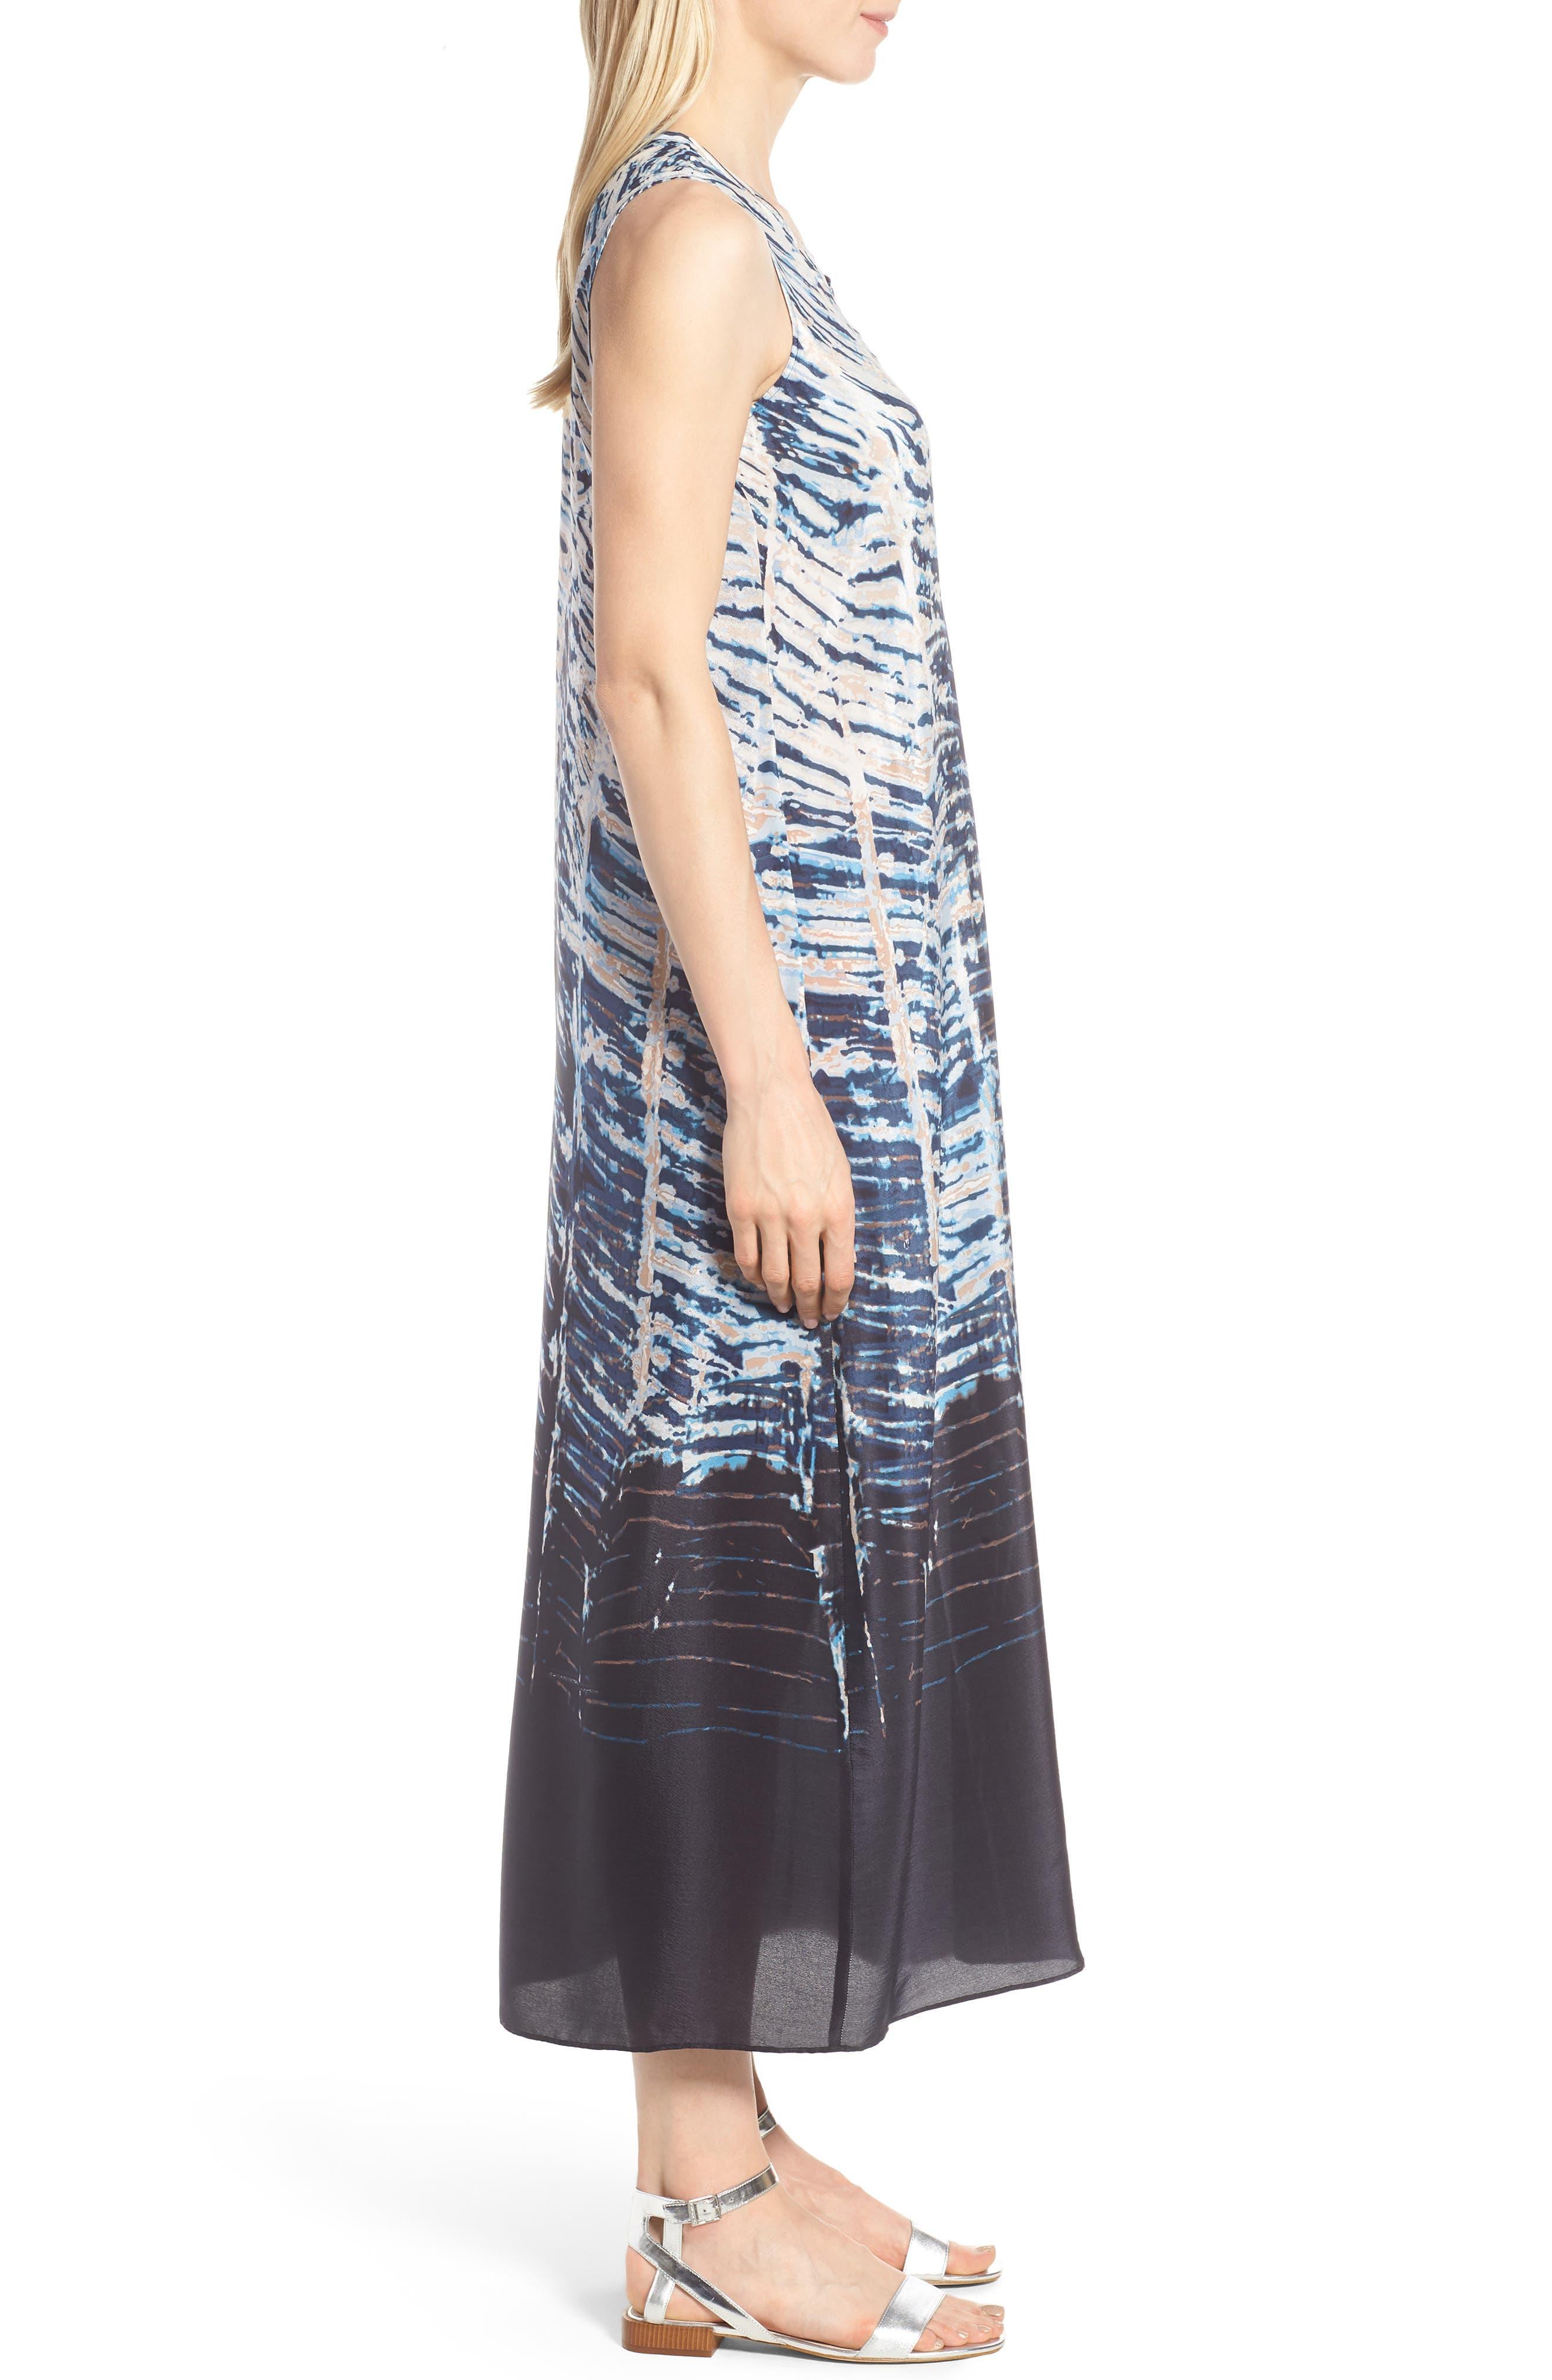 Tinango Tank Dress,                             Alternate thumbnail 3, color,                             490